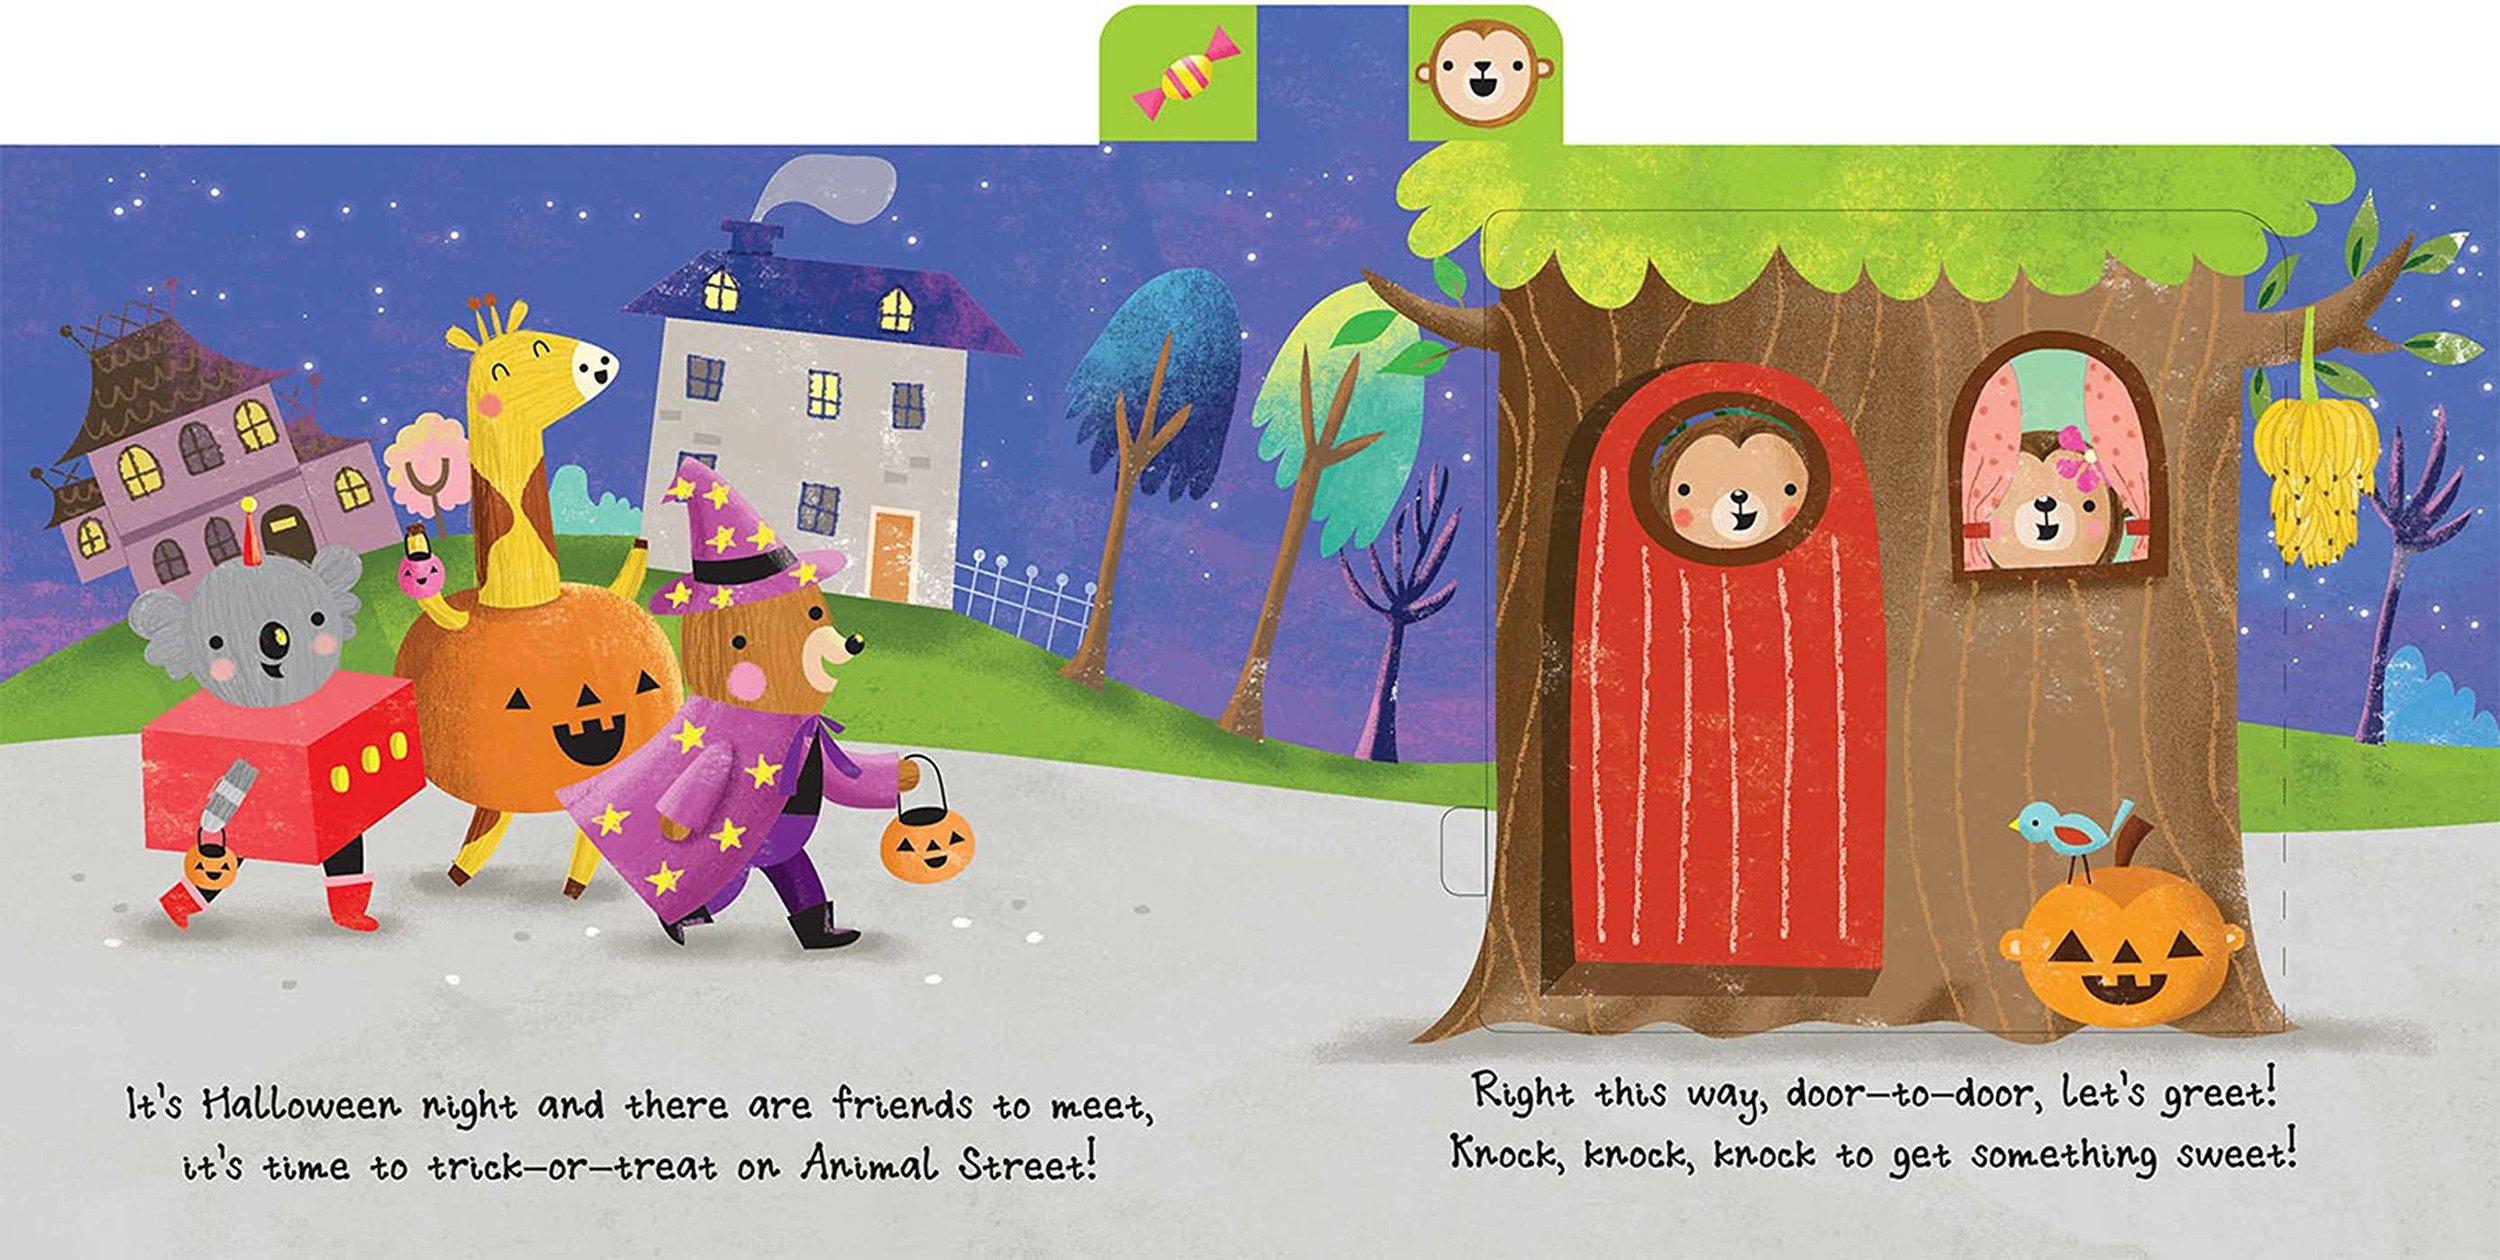 Trick or treat on animal street book spread - Coco Gigi Design.jpg